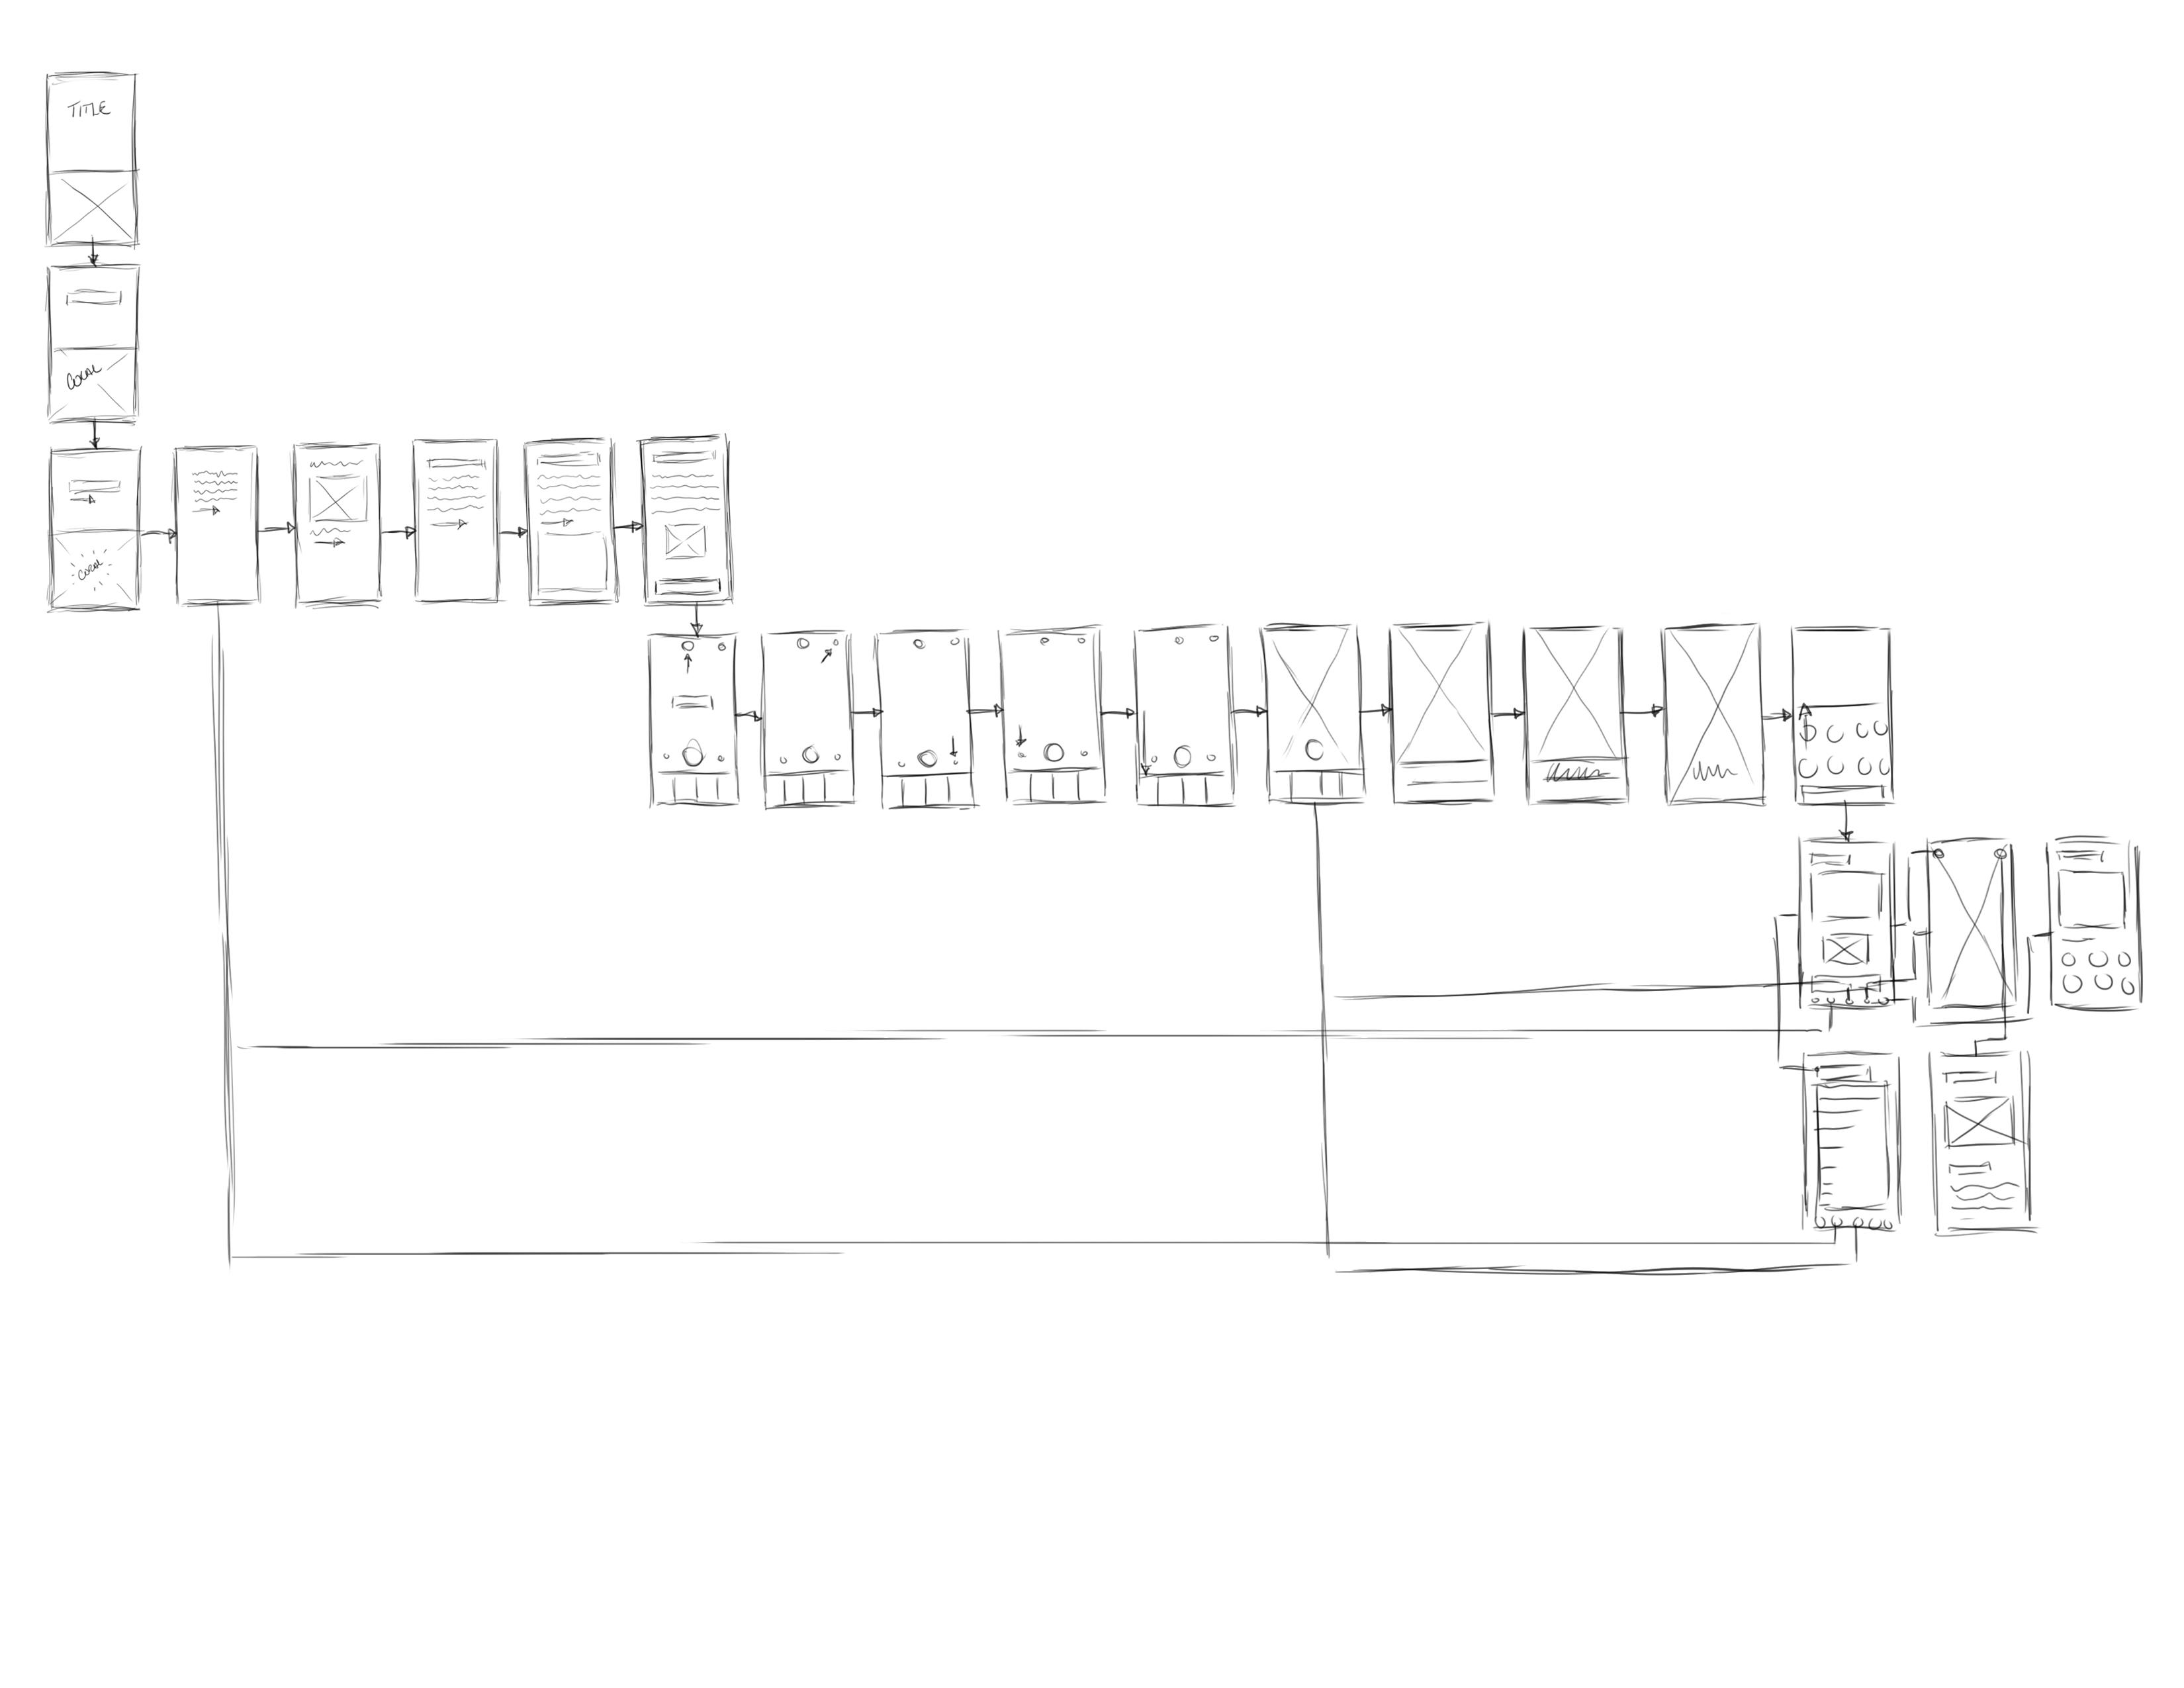 Basic wireframe sketches